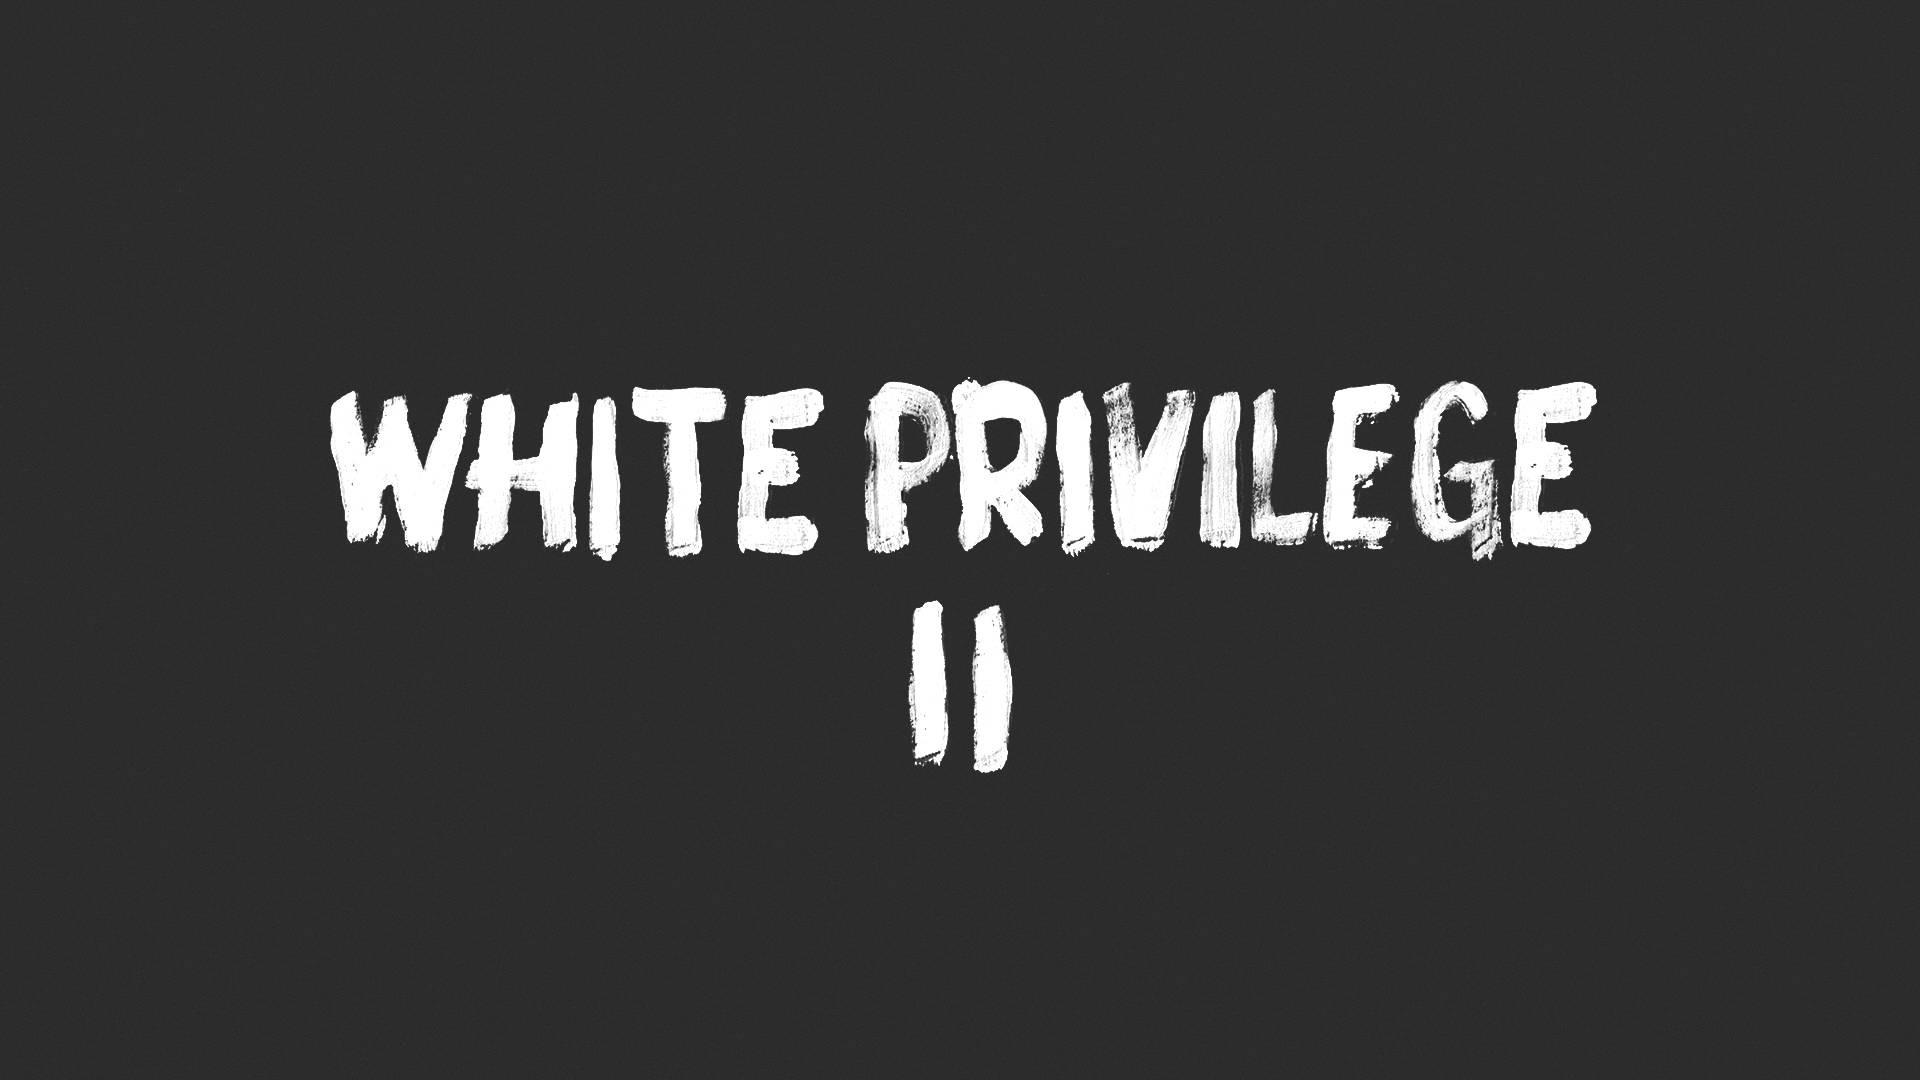 Res: 1920x1080, JAMILA WOODS - WHITE PRIVILEGE II - YouTube